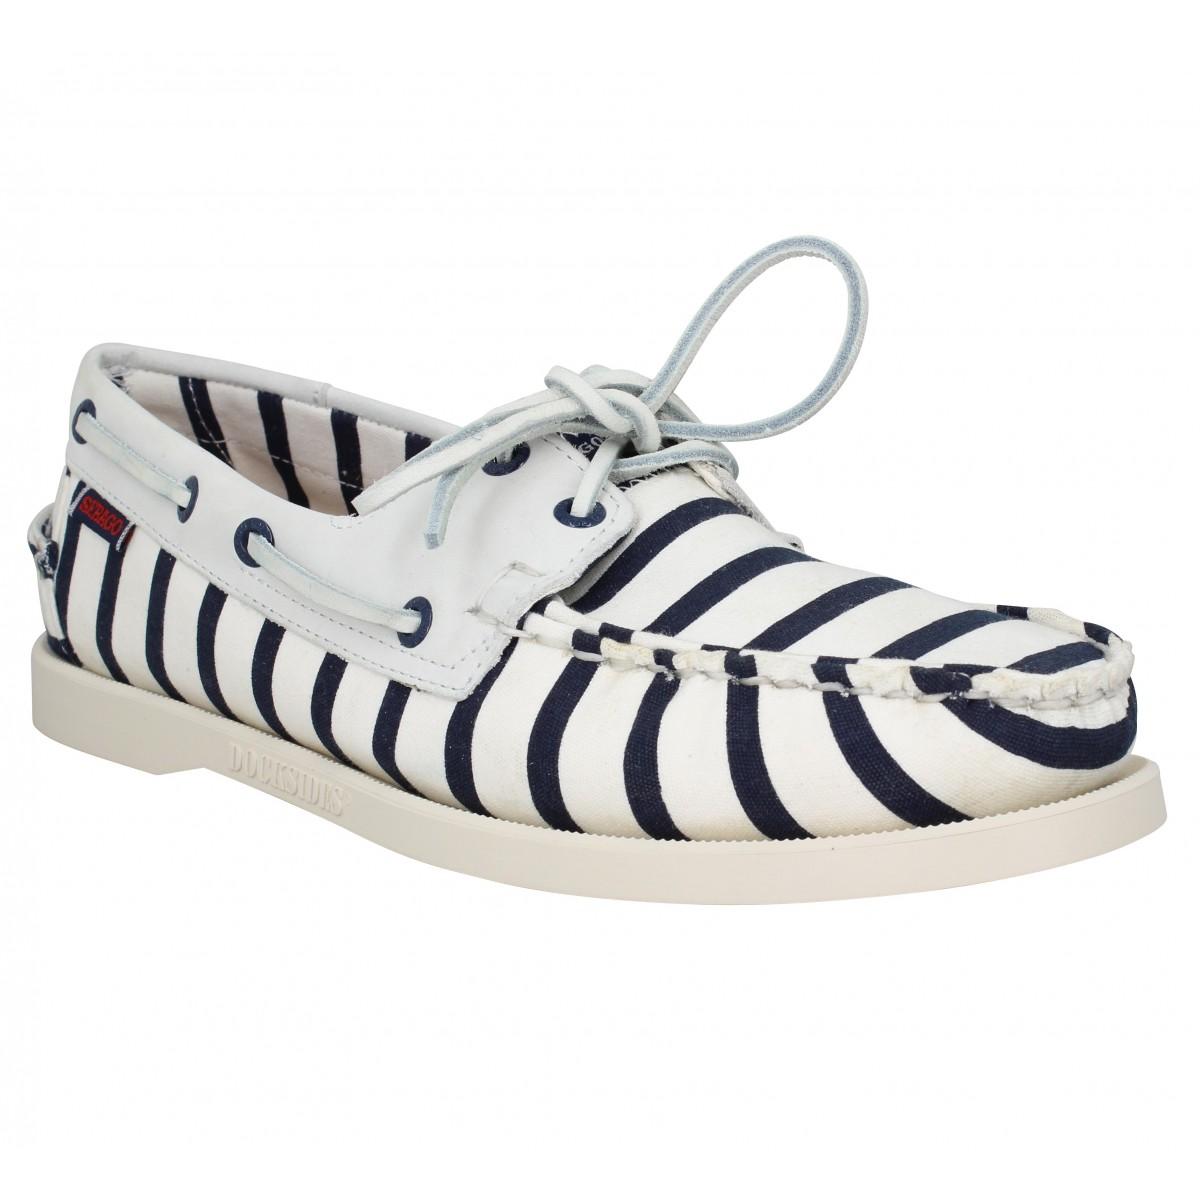 Chaussures bateaux SEBAGO X ARMOR LUX Spinnaker Stripe toile Homme Blanc